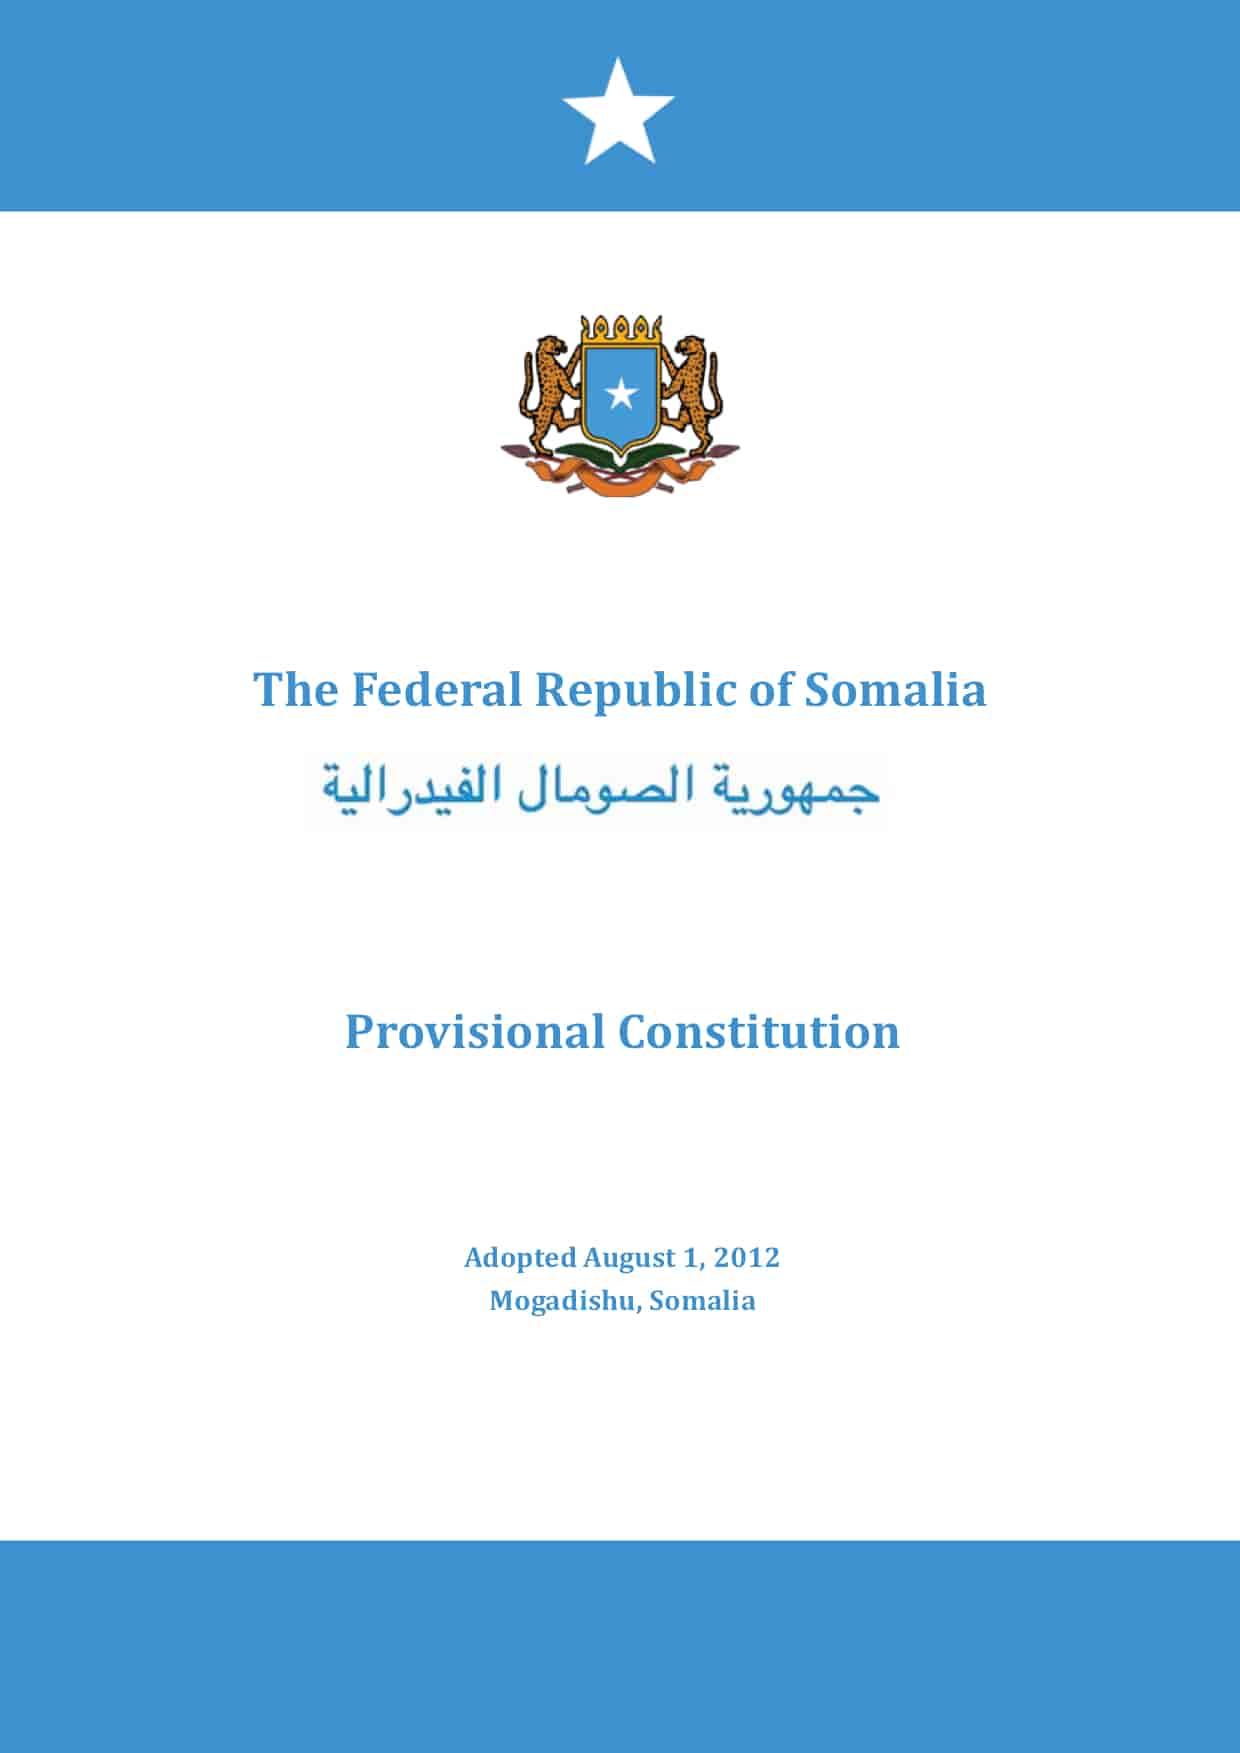 ec-undp-jtf-somalia-federal-constitution